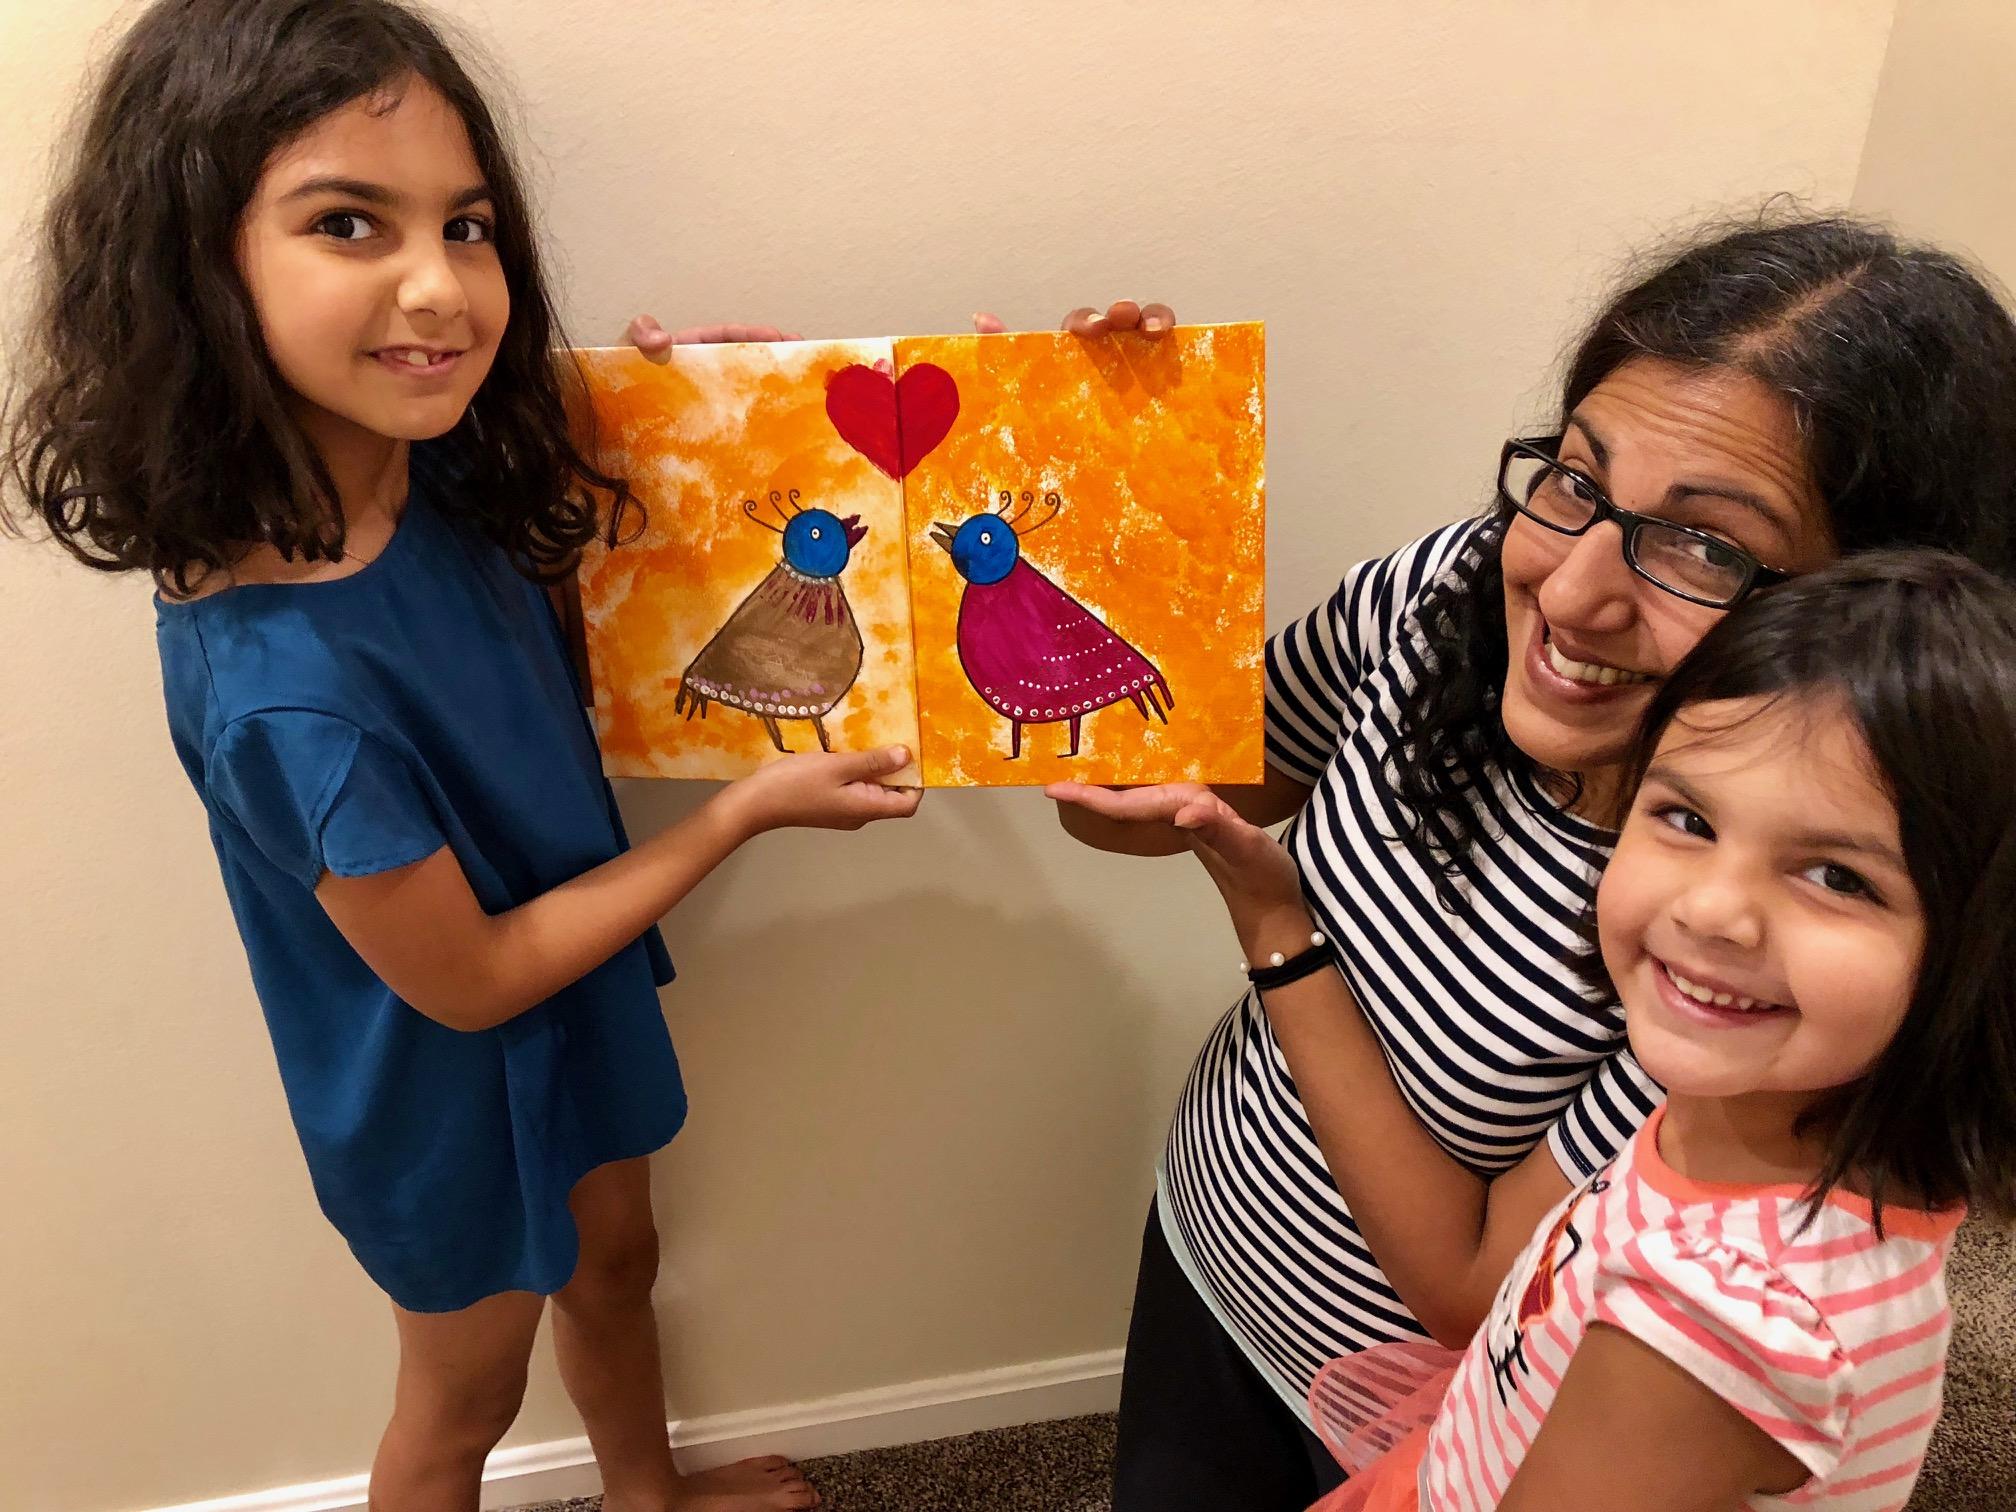 COPYCAT Art Workshop - Parent/child art workshop- collaborate to create one piece of artwork!